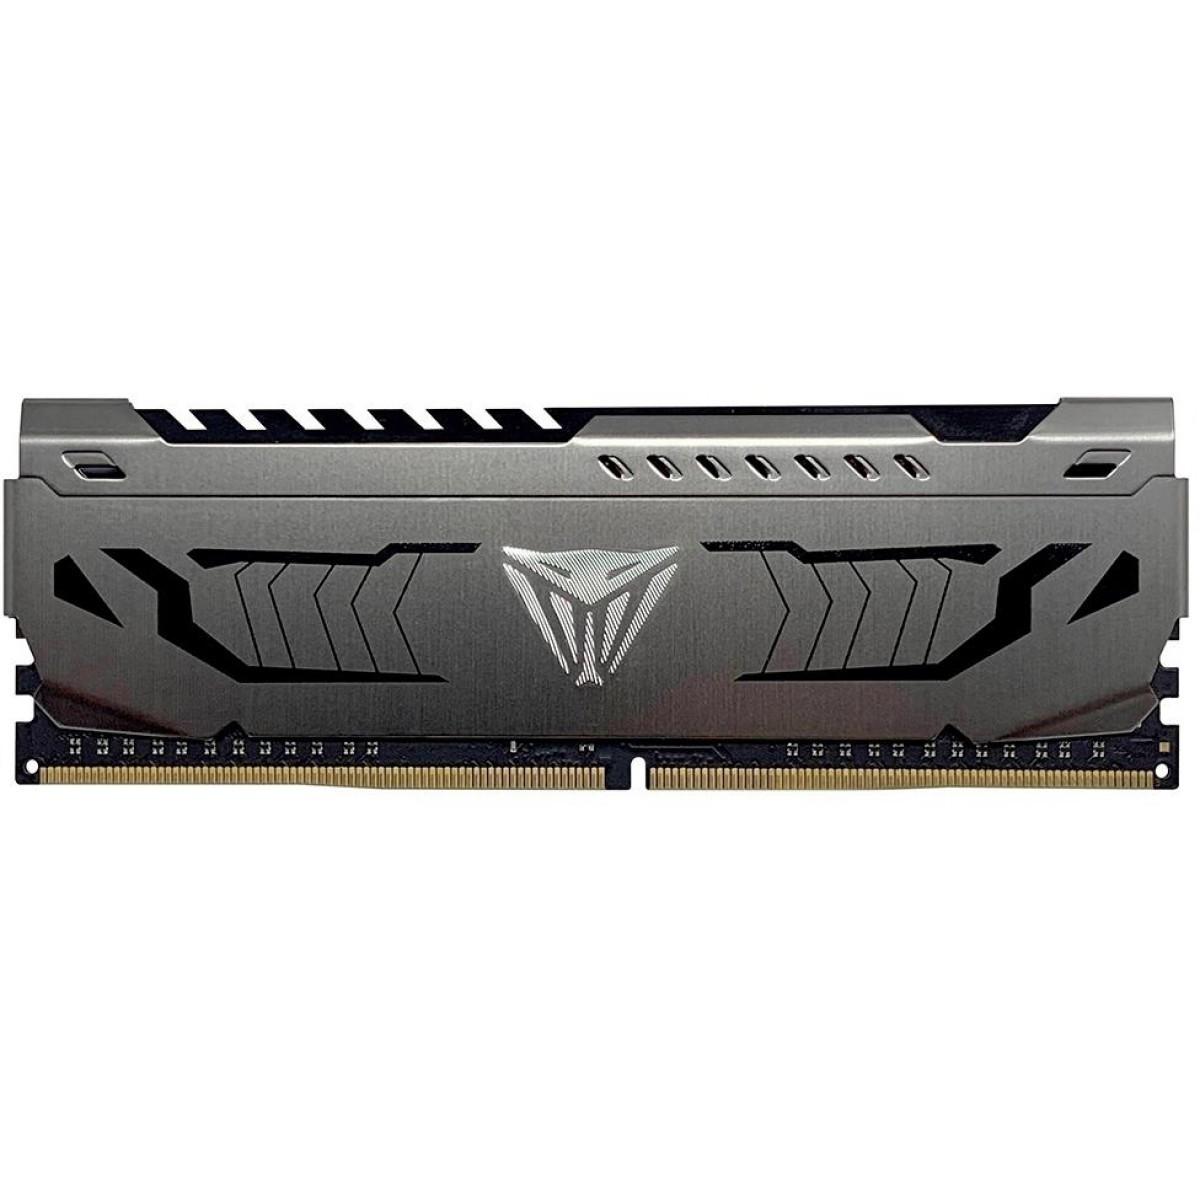 MEMÓRIA VIPER STEEL 16GB DDR4 3000MHZ CL16 PVS416G300C6 - PATRIOT